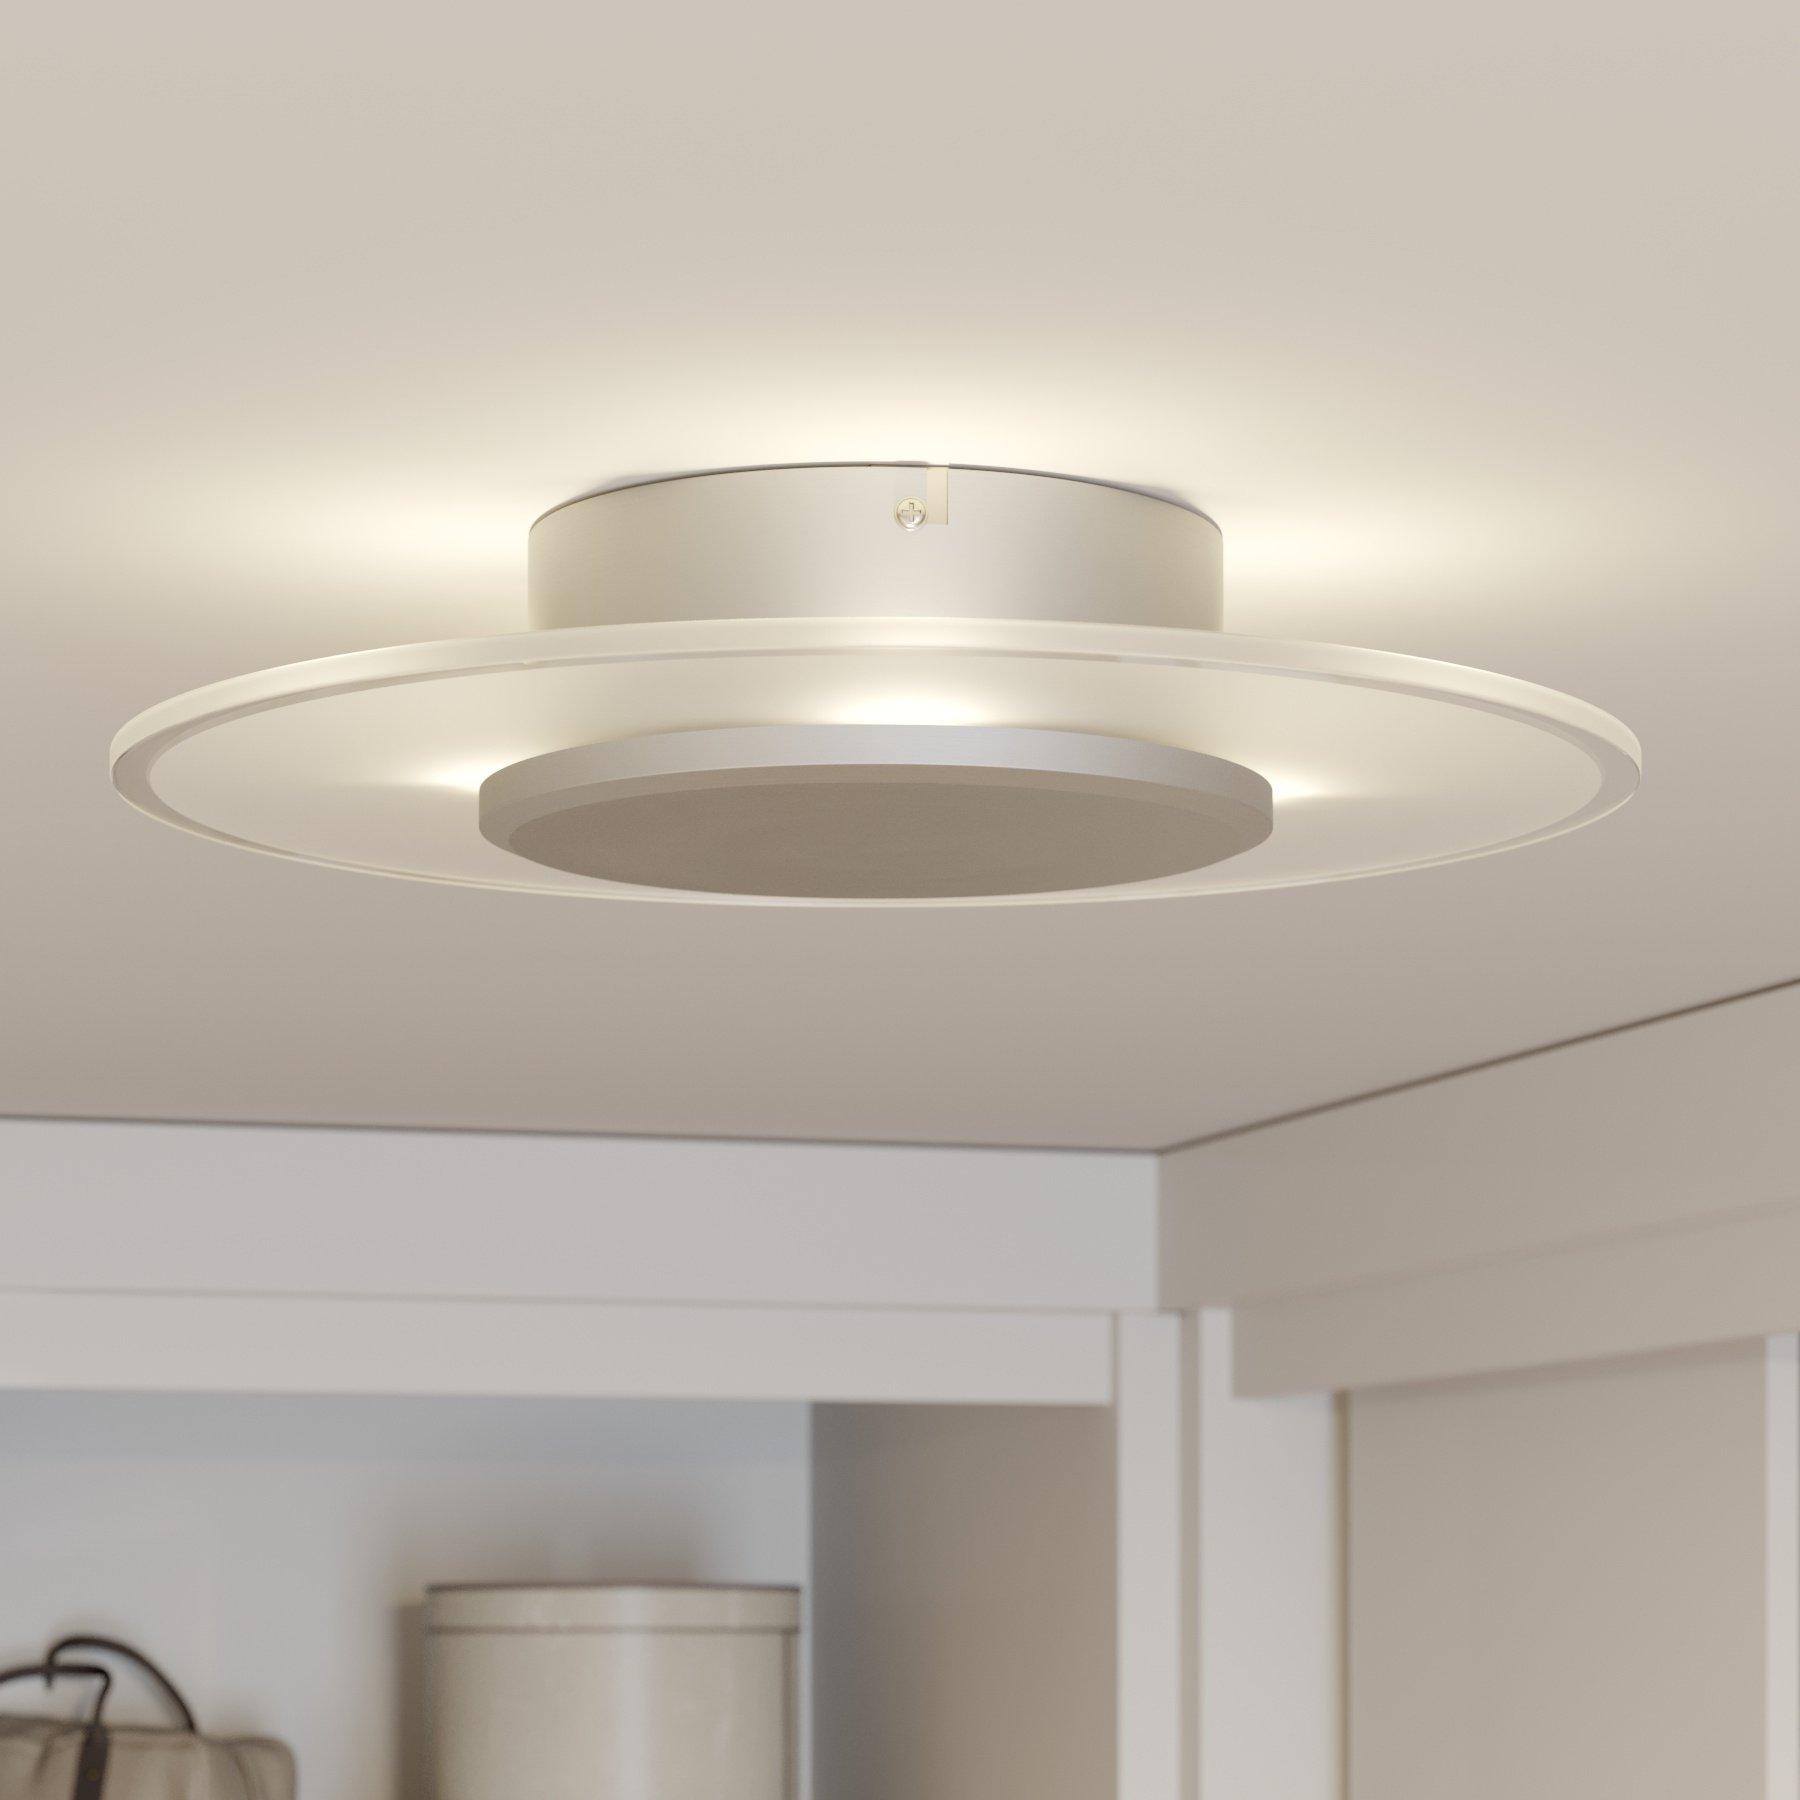 Velformet LED-taklampe Dora, dimbar